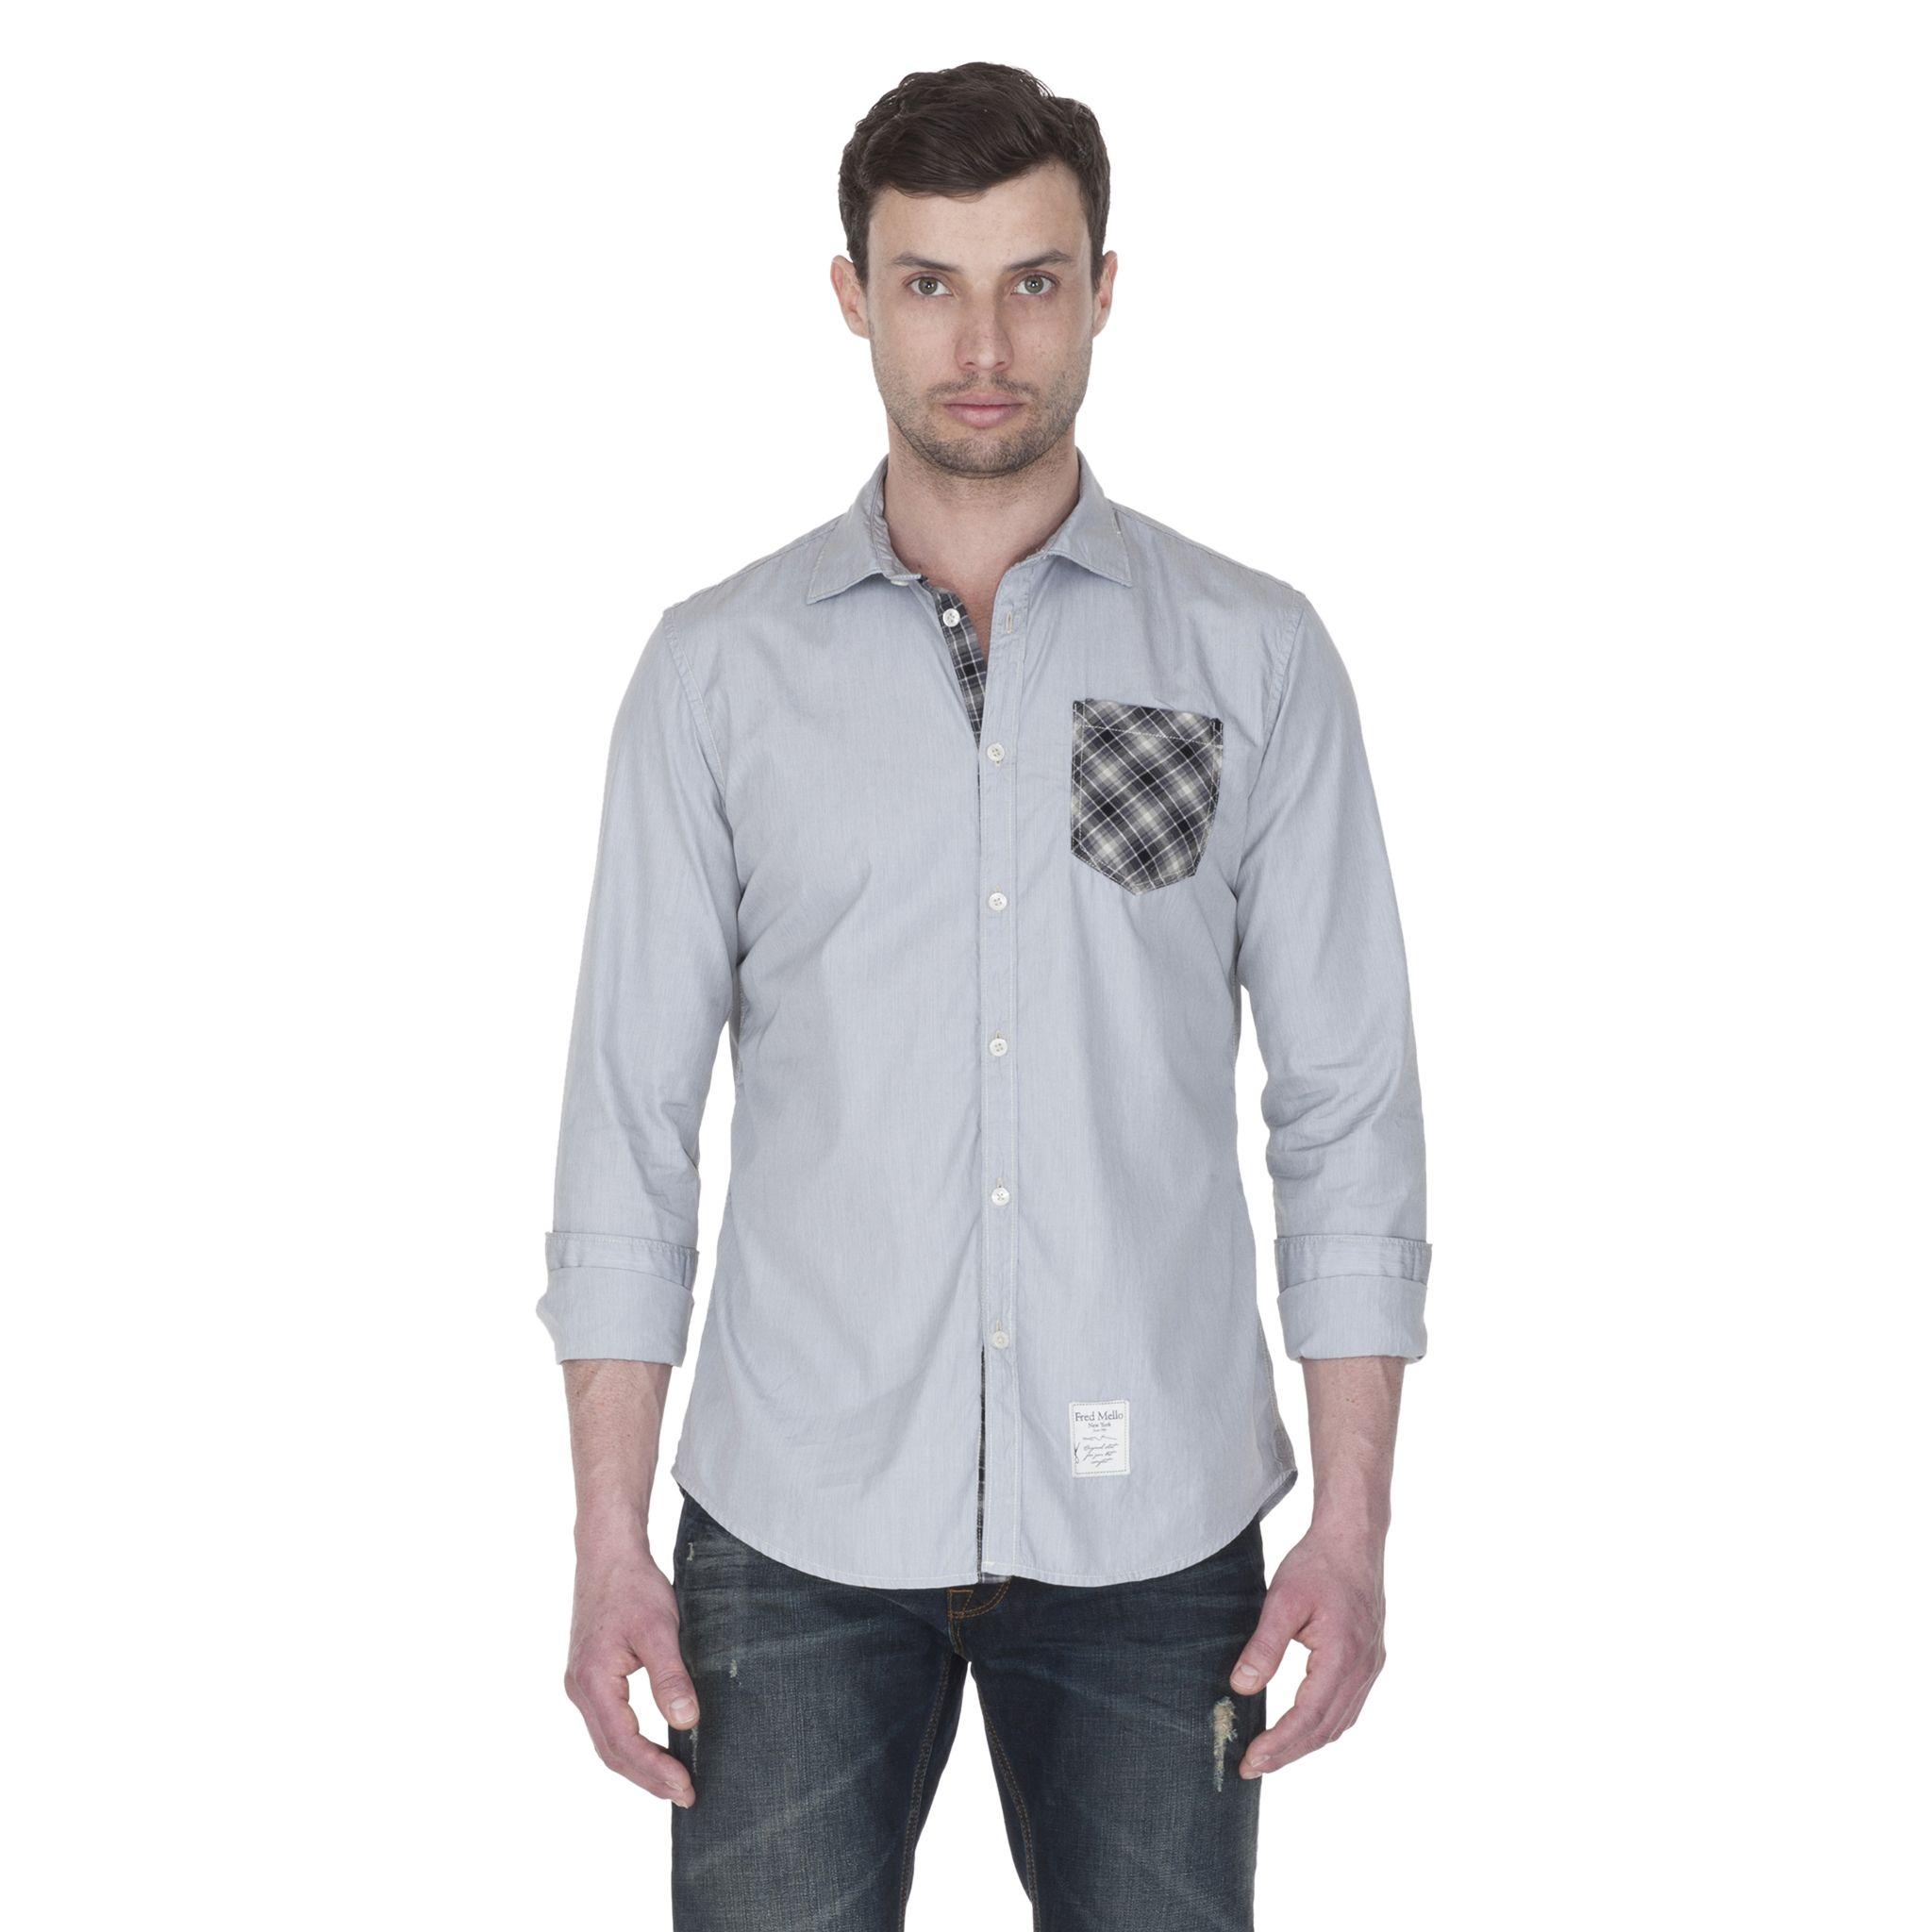 Shirt fall winter 13 collection#fredmello #shirt #fredmello1982 #newyork #fallwinter13 #accessibleluxury #cool #usa #mancollection